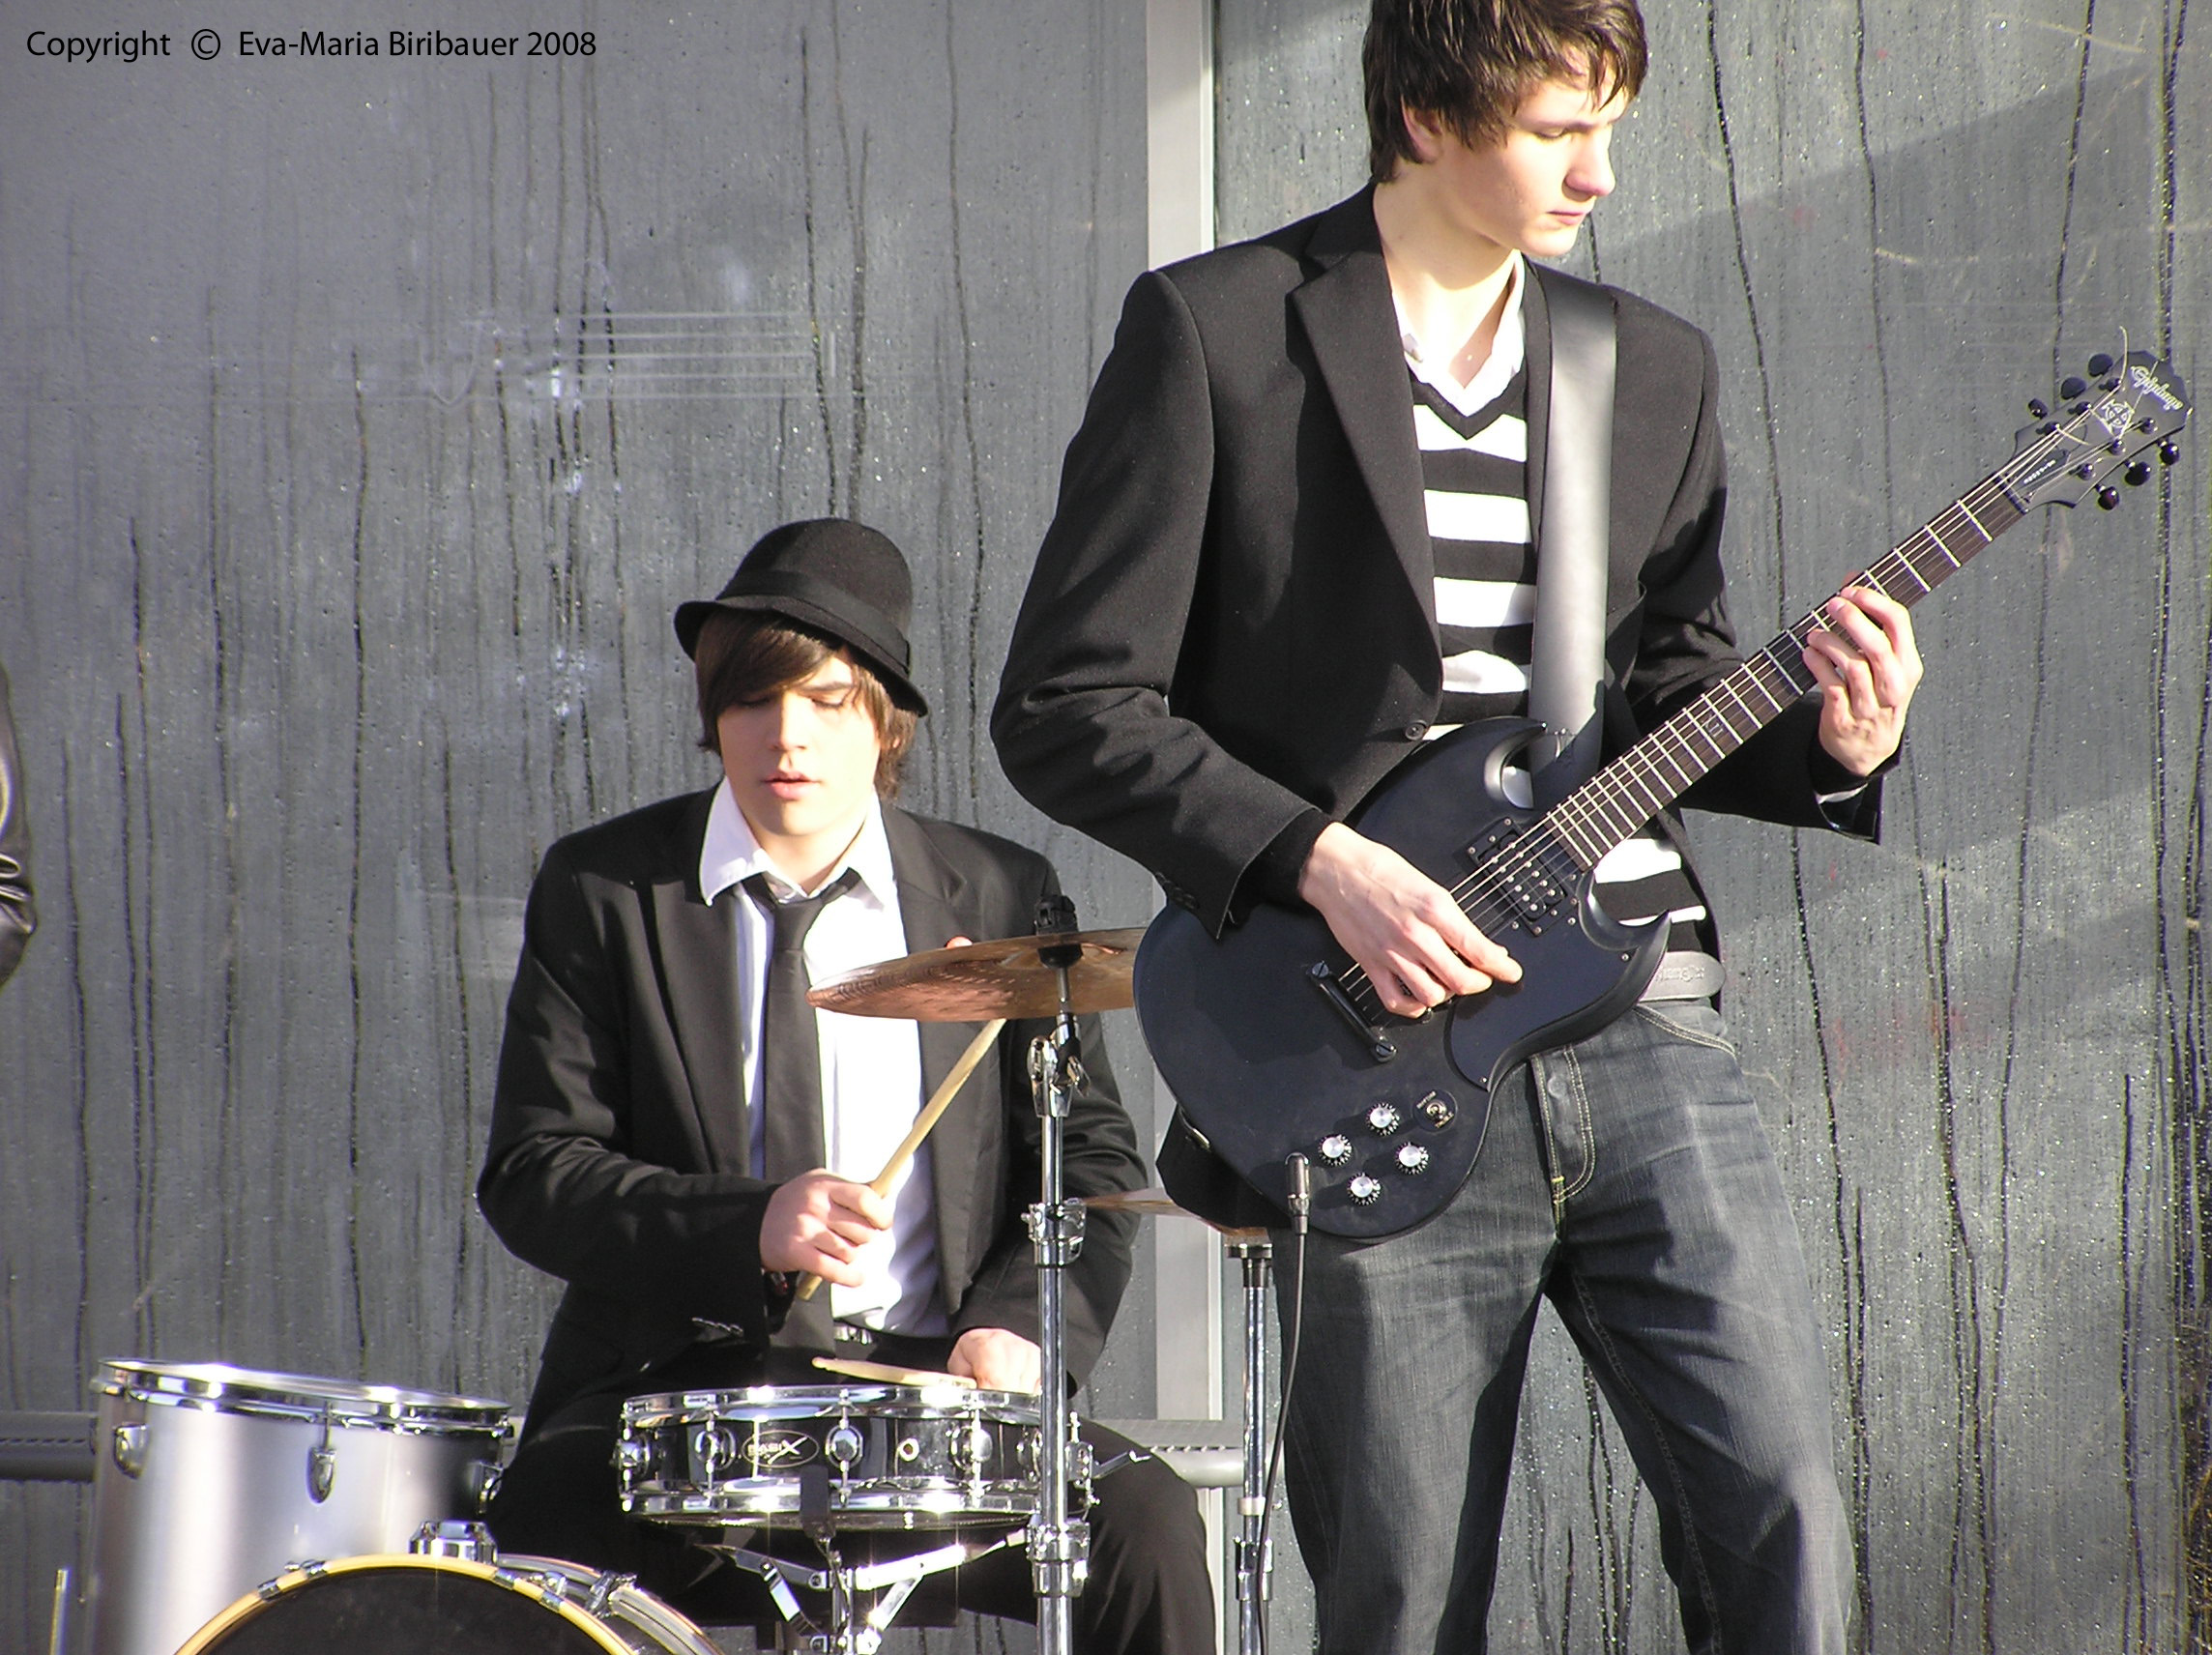 Video clip, Svensklik Perra, Styling 2008